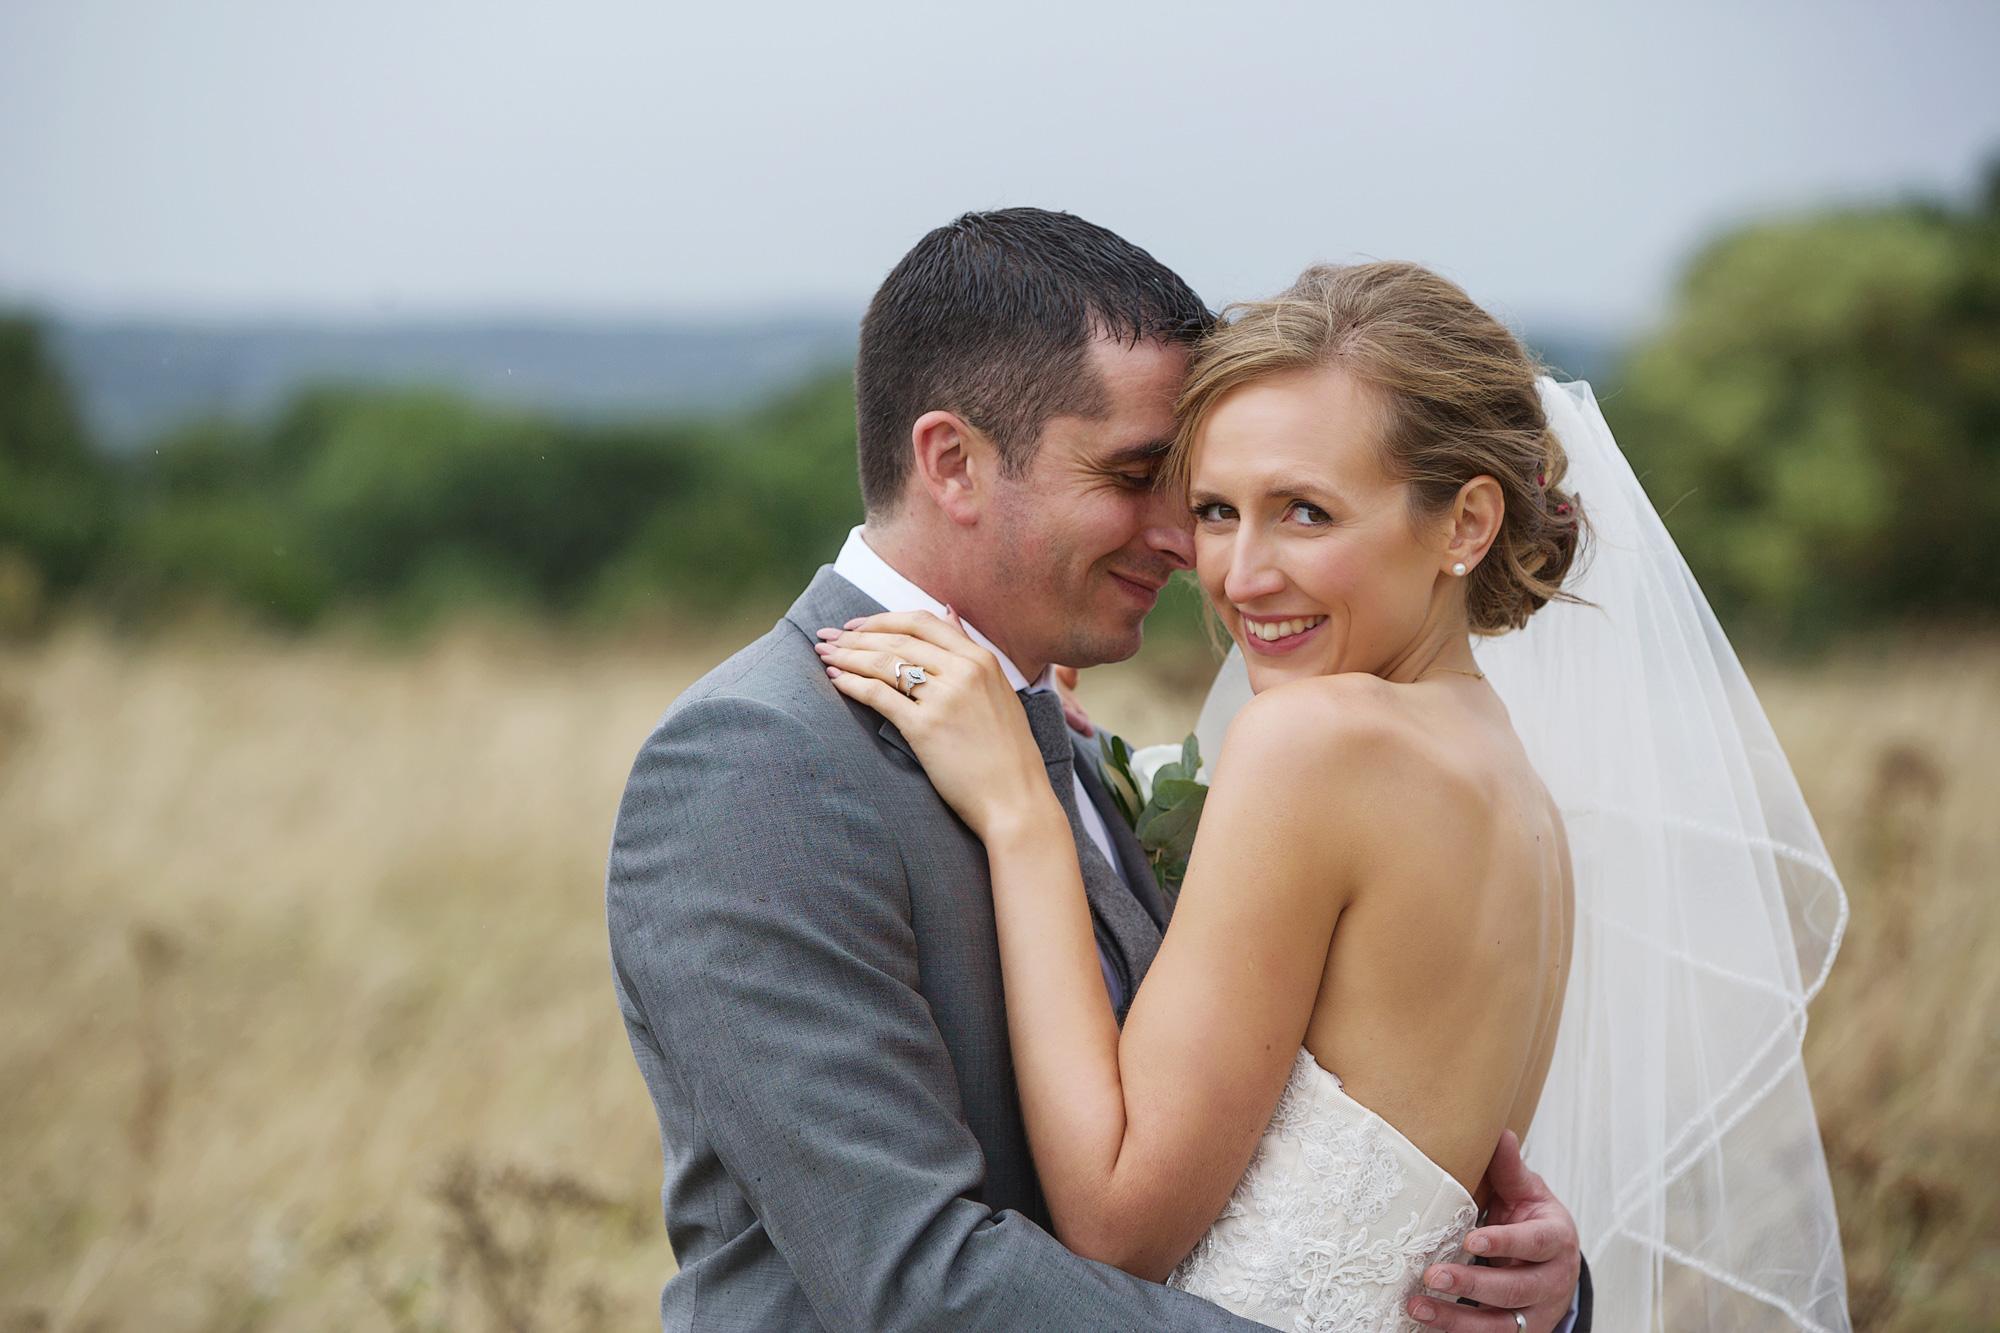 Adam_Hillier_Wedding_Photographer_Newbury_Berkshire_3 (10).jpg